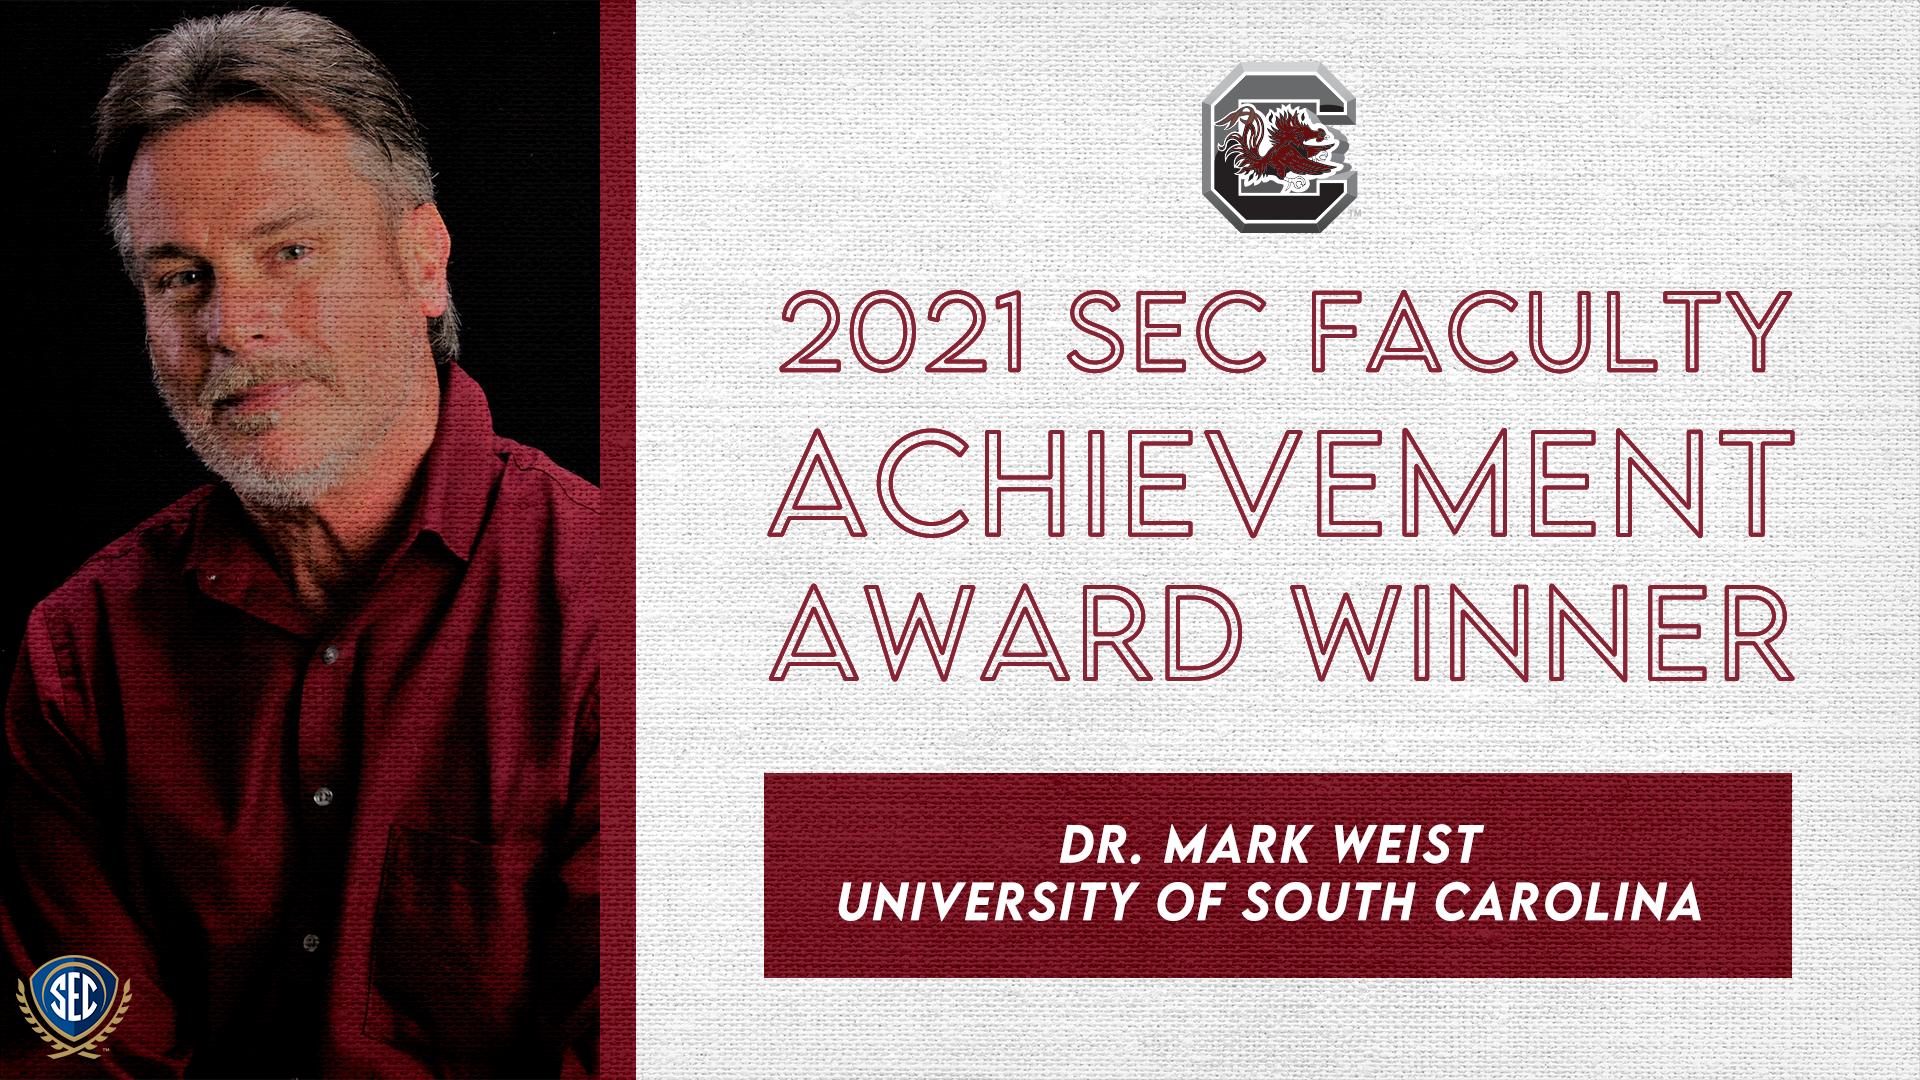 SEC Announces Dr. Mark Weist Wins 2021 Faculty Achievement Award for University of South Carolina